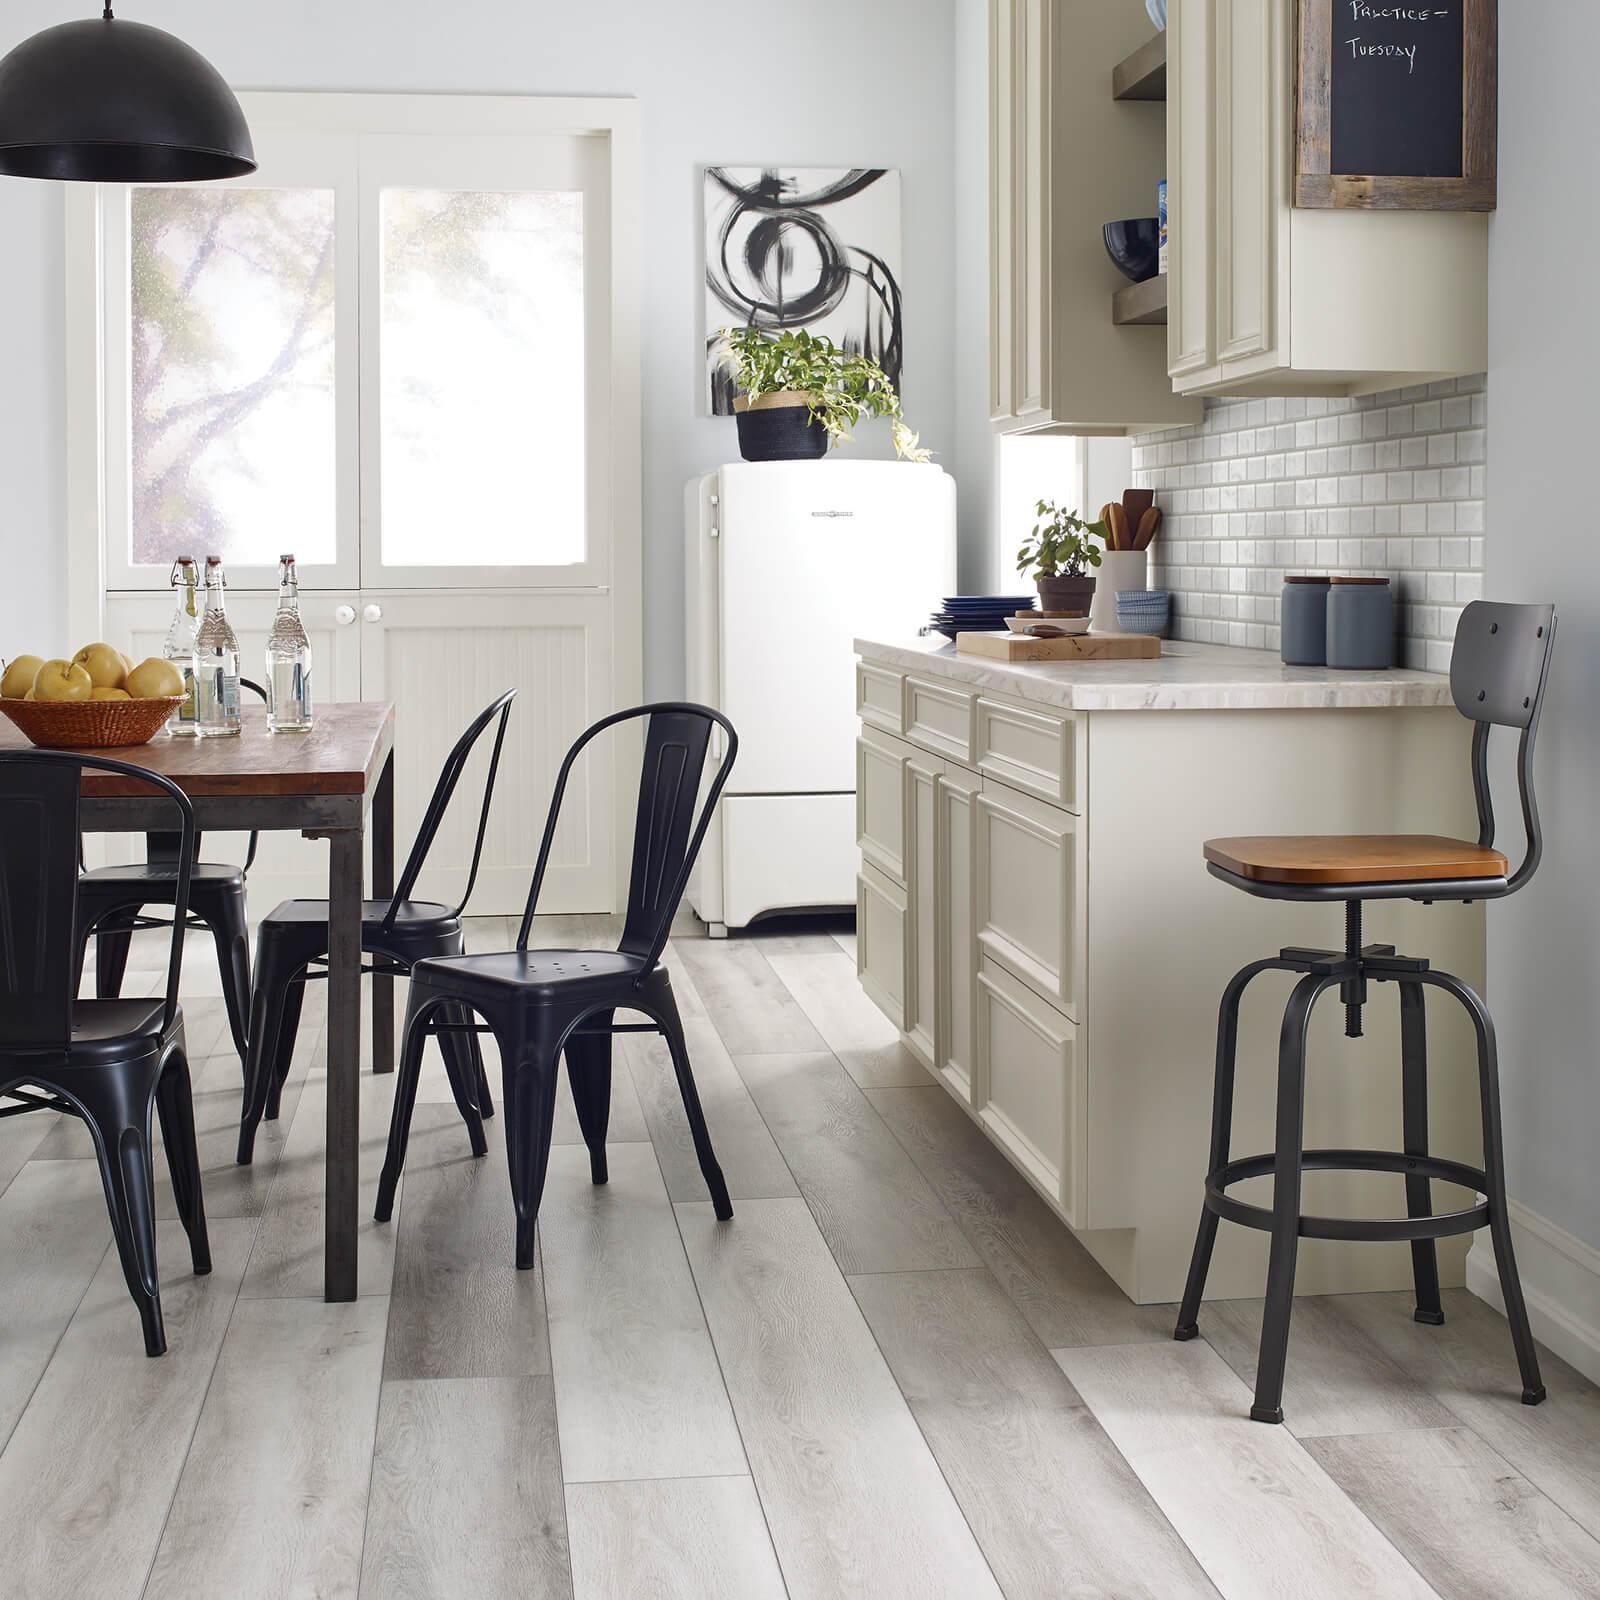 Farmhouse kitchen vinyl floring | Dolphin Carpet & Tile